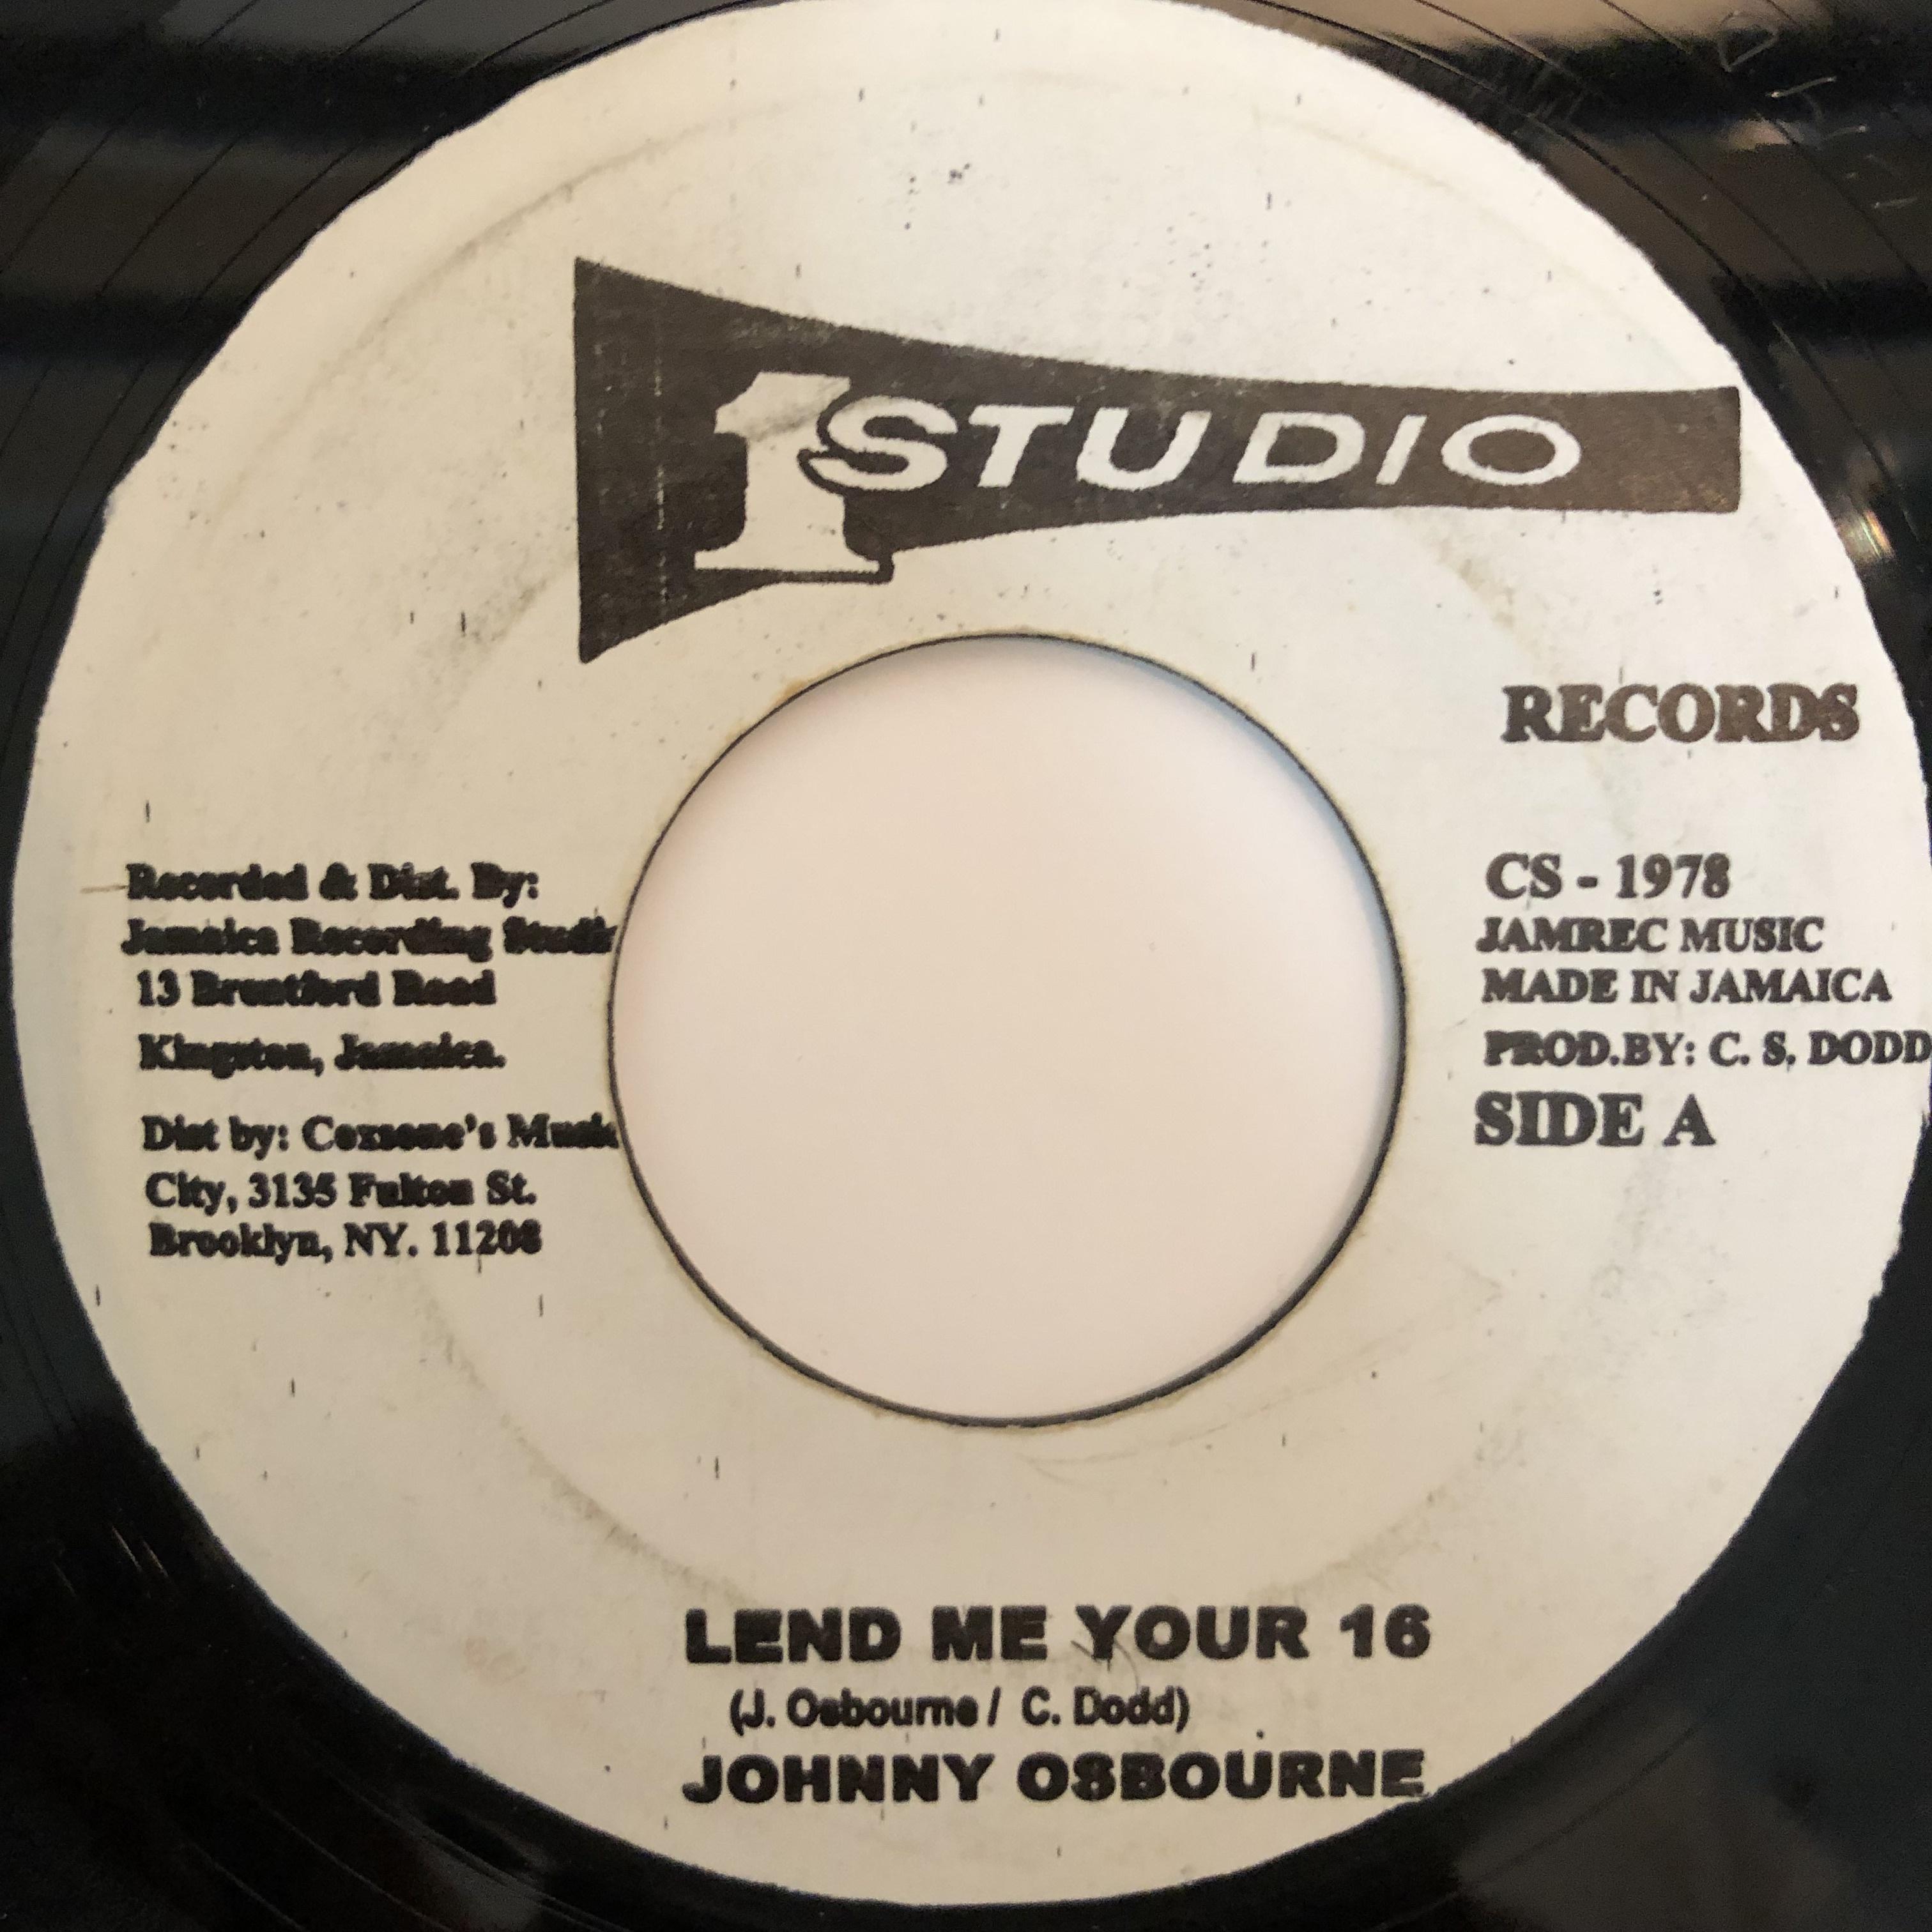 Johnny Osbourne - Lend Me Your 16【7-20328】